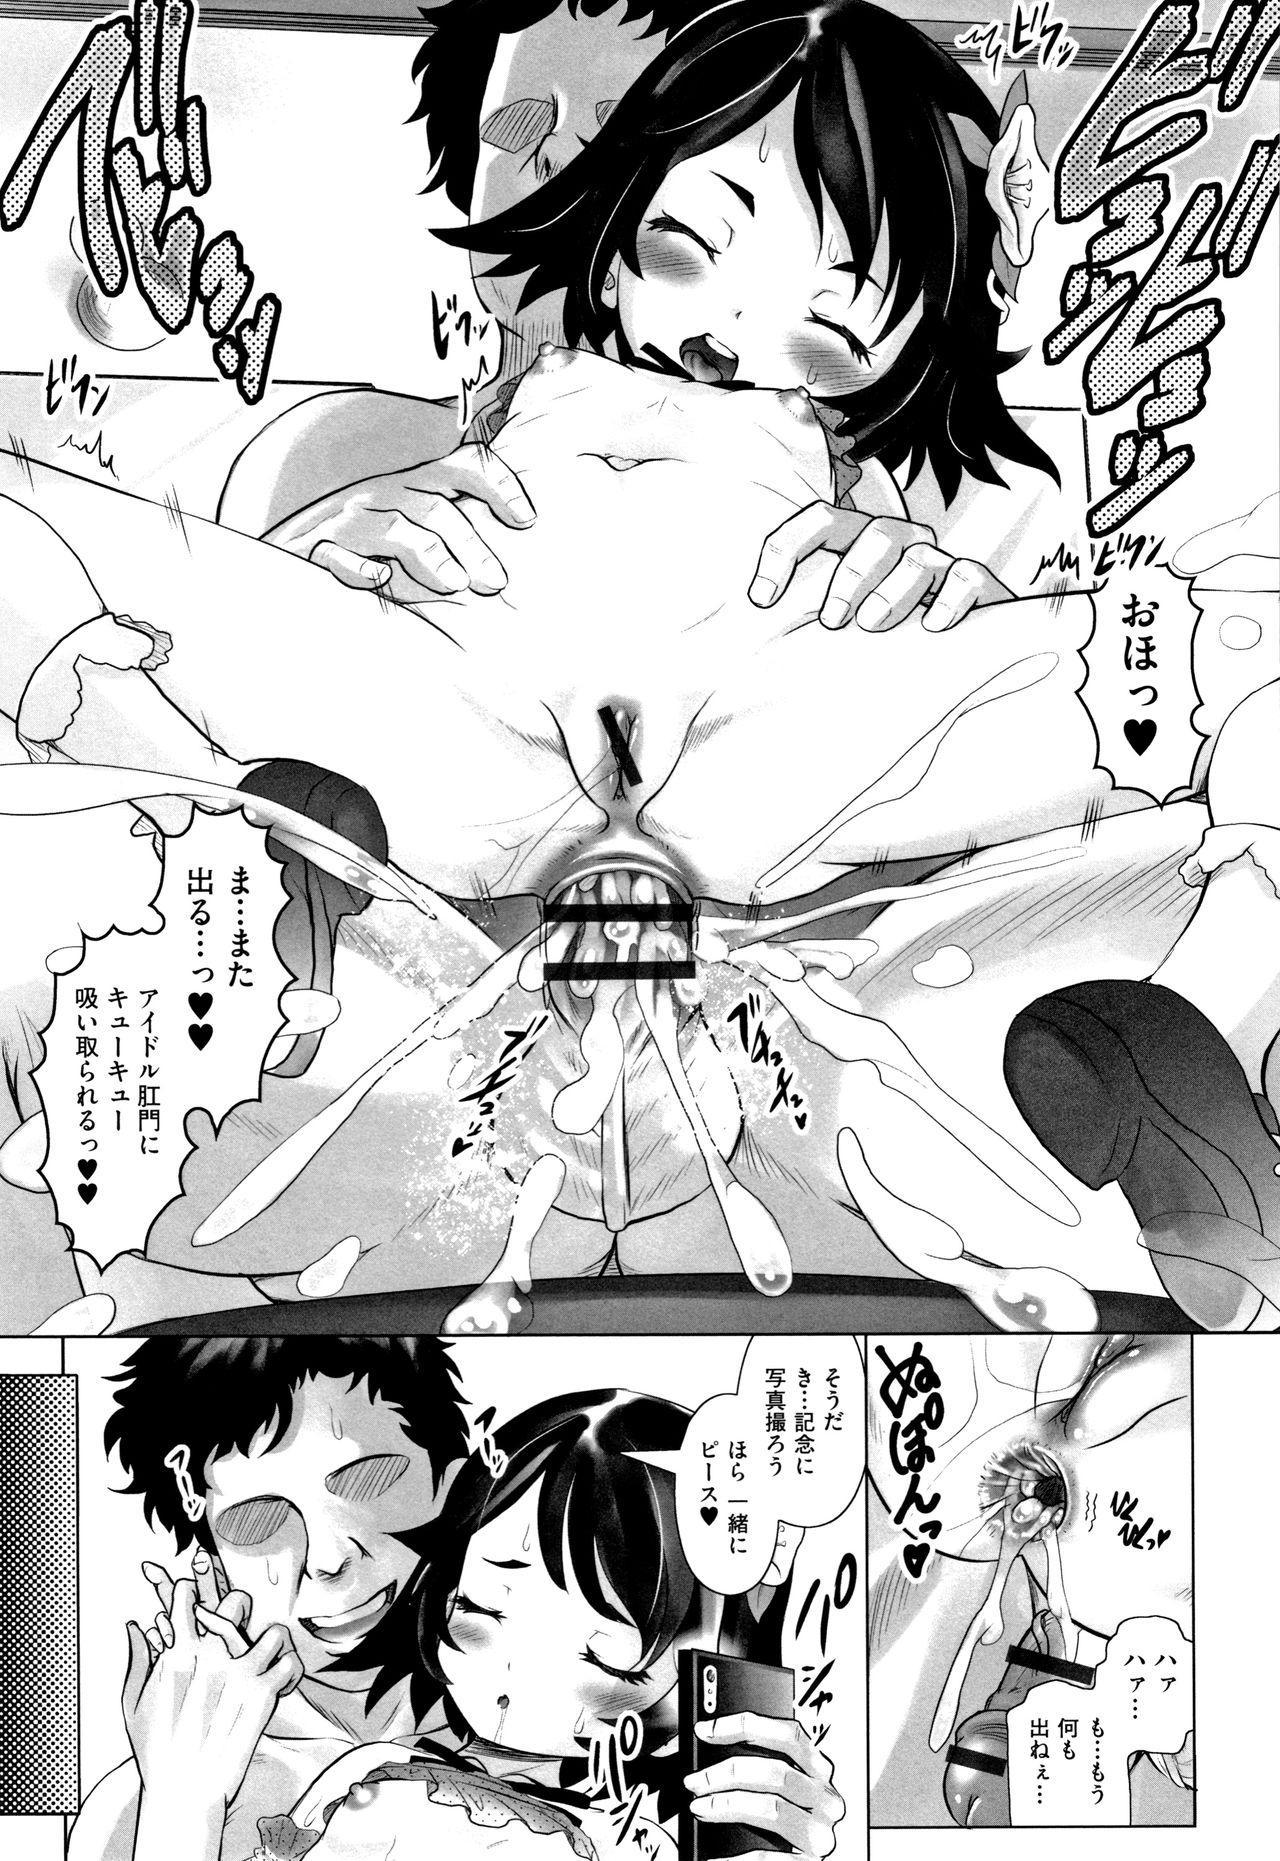 Shoujo Kumikyoku 11 149